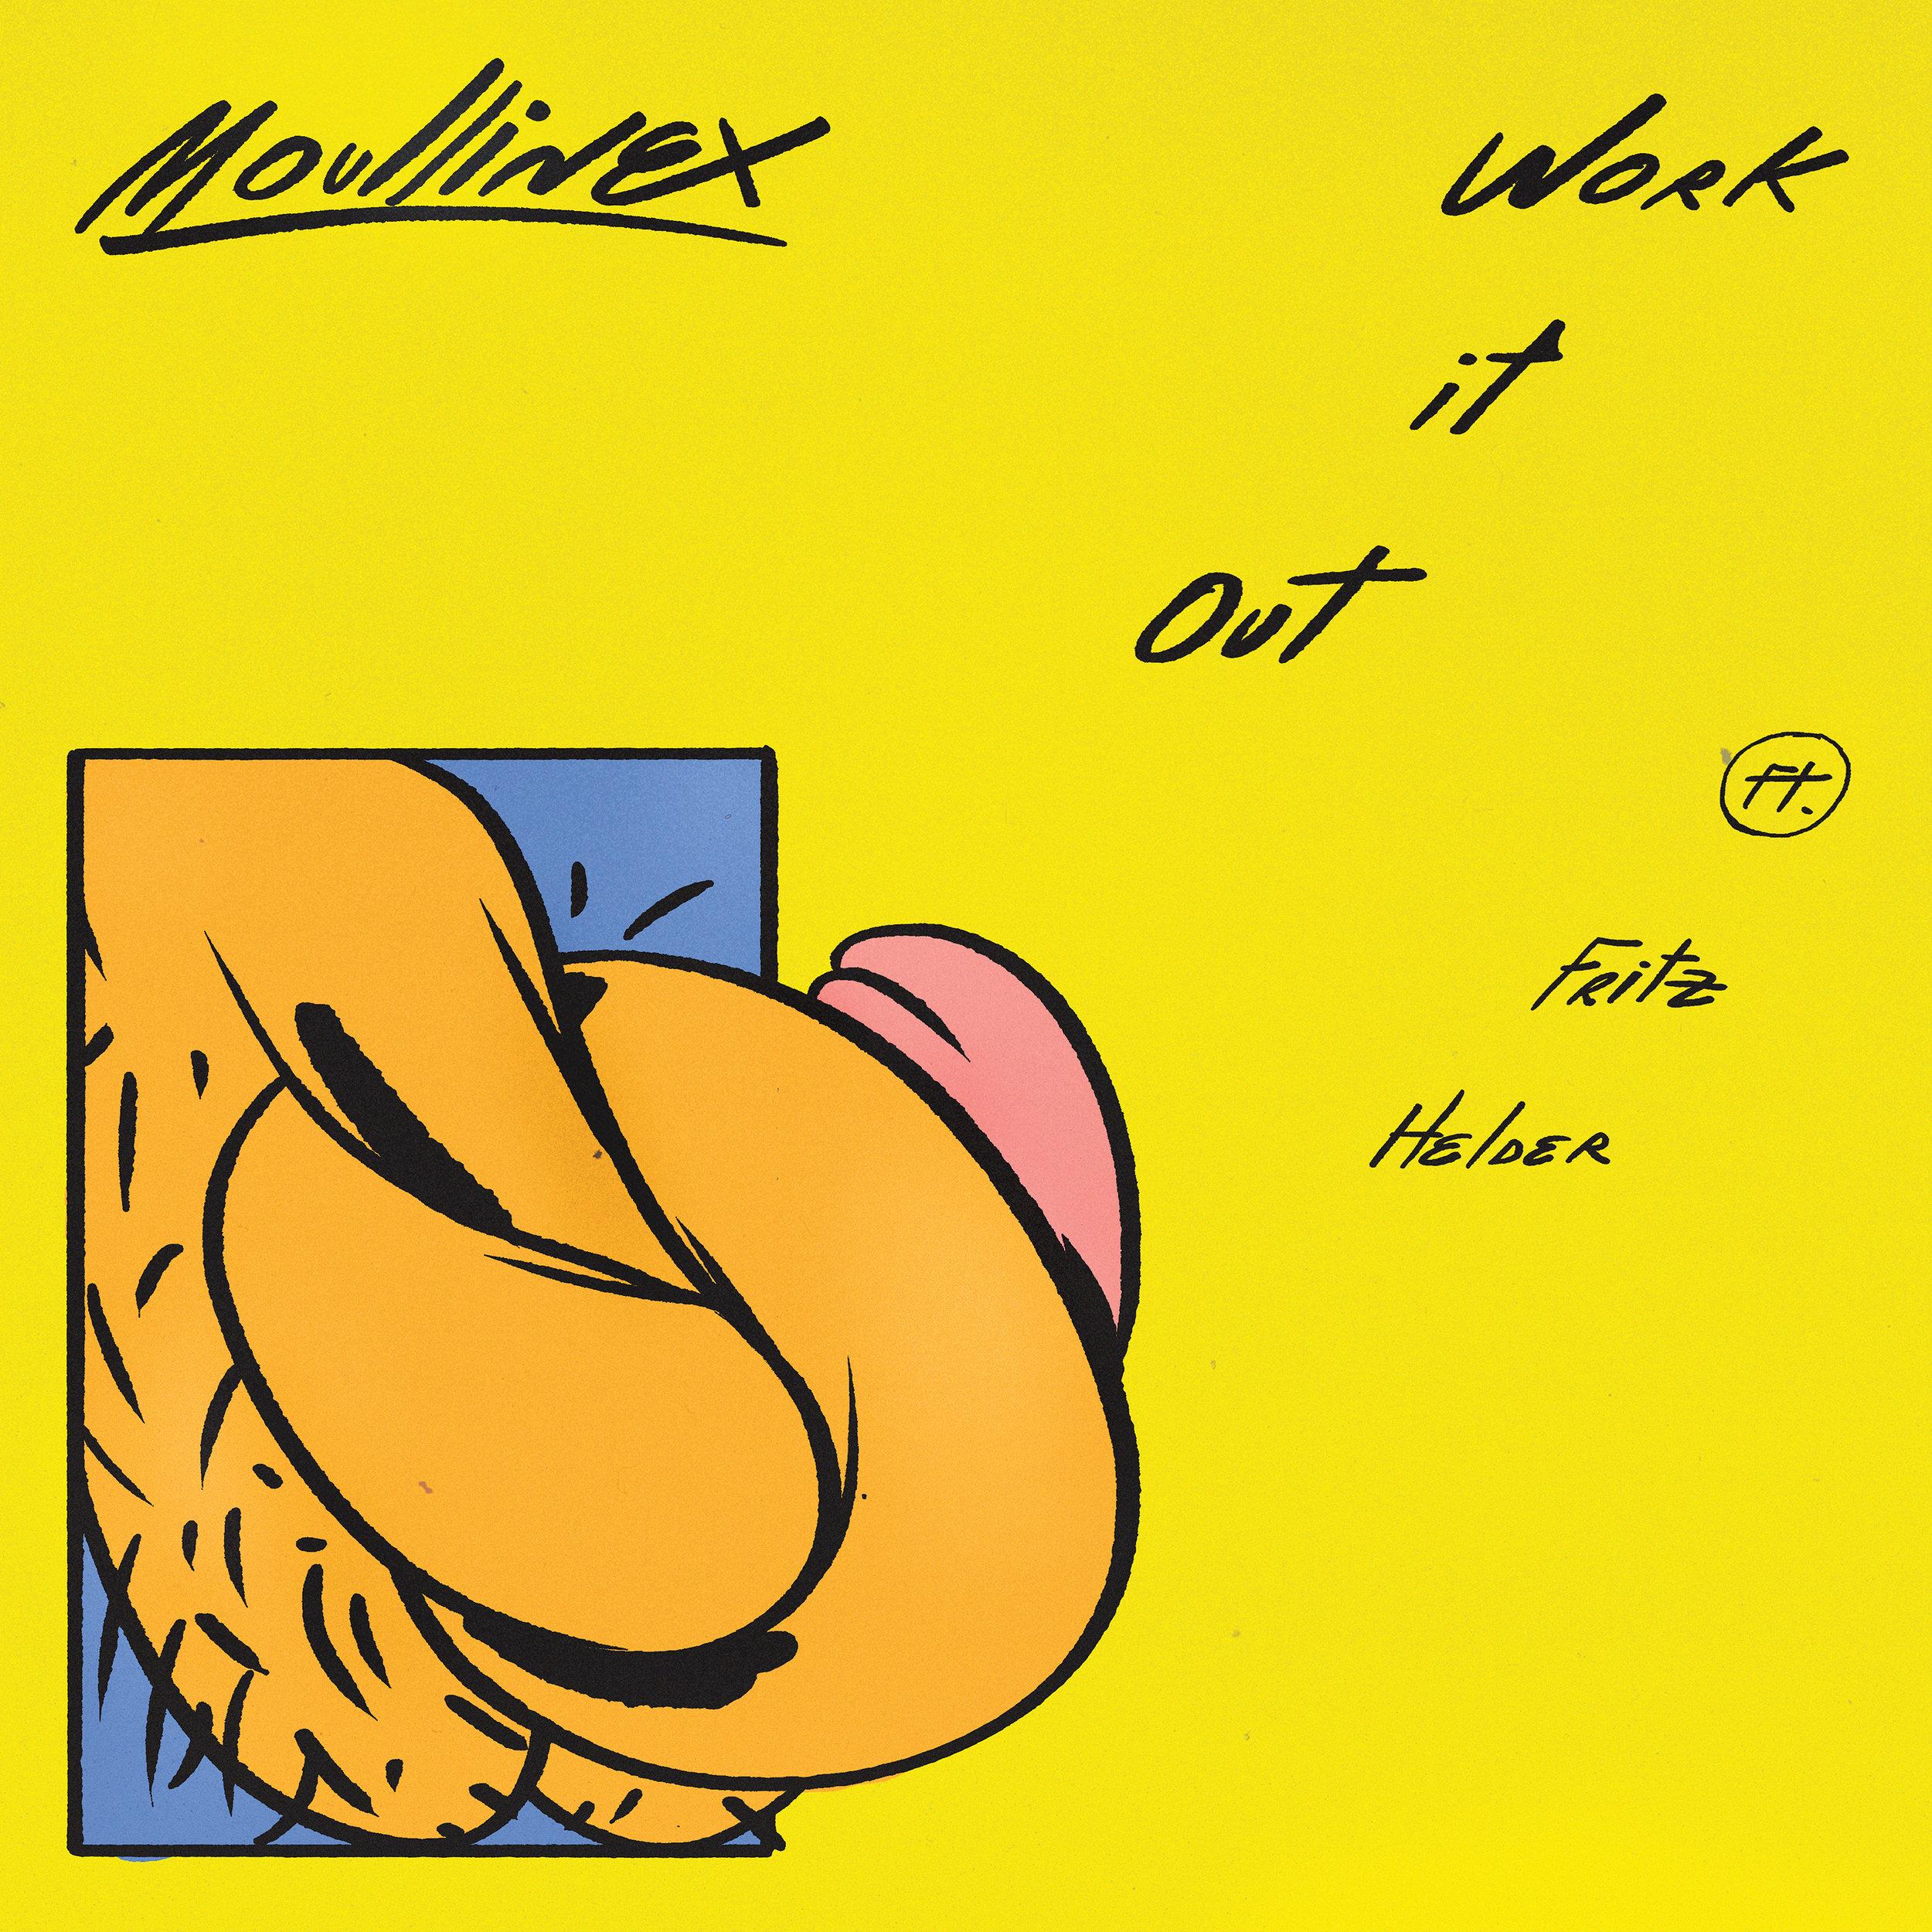 DT078: Moullinex - Work It Out feat. Fritz Helder